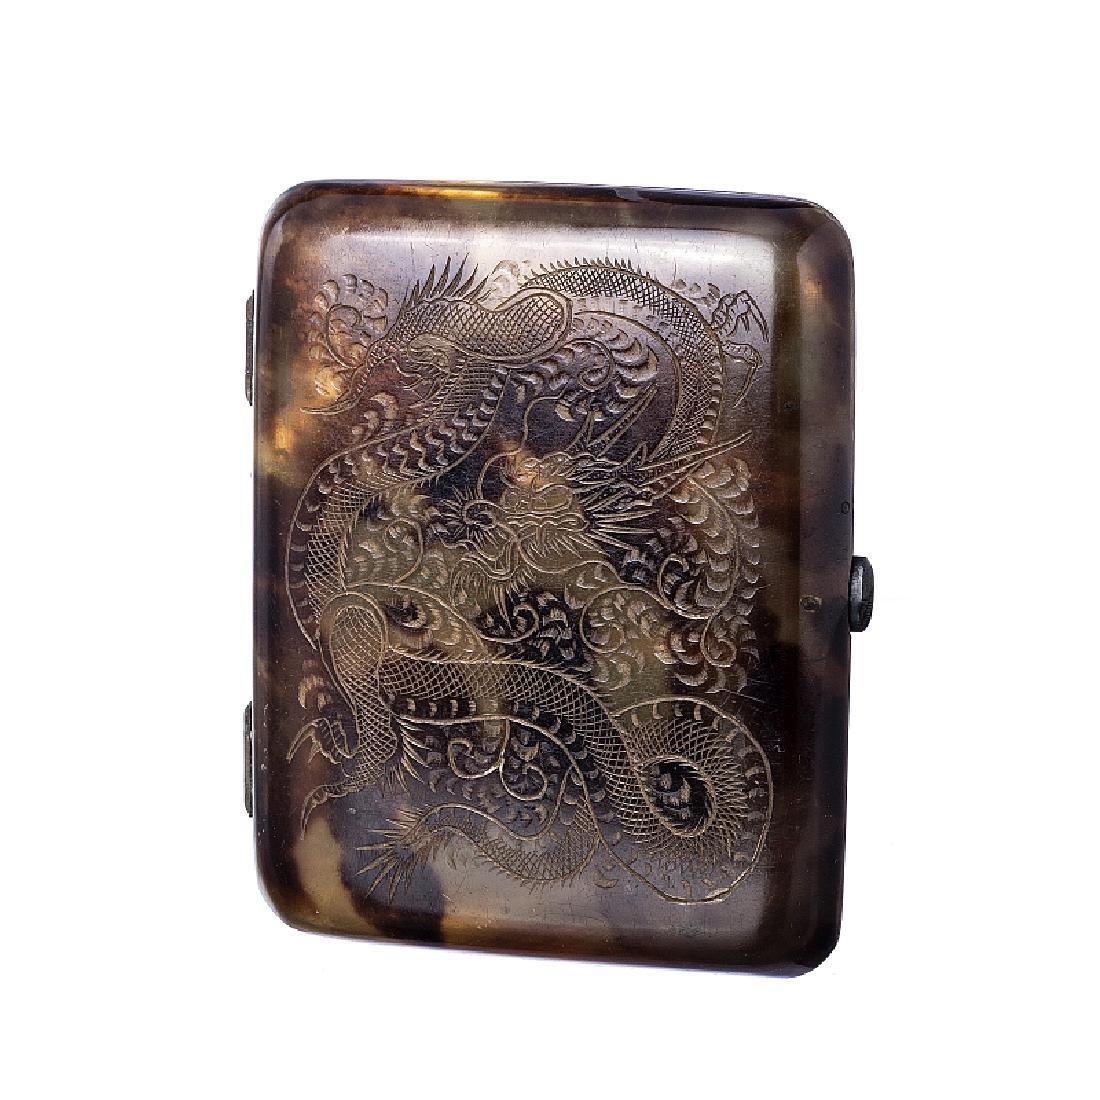 Tortoiseshell dragon cigarette case